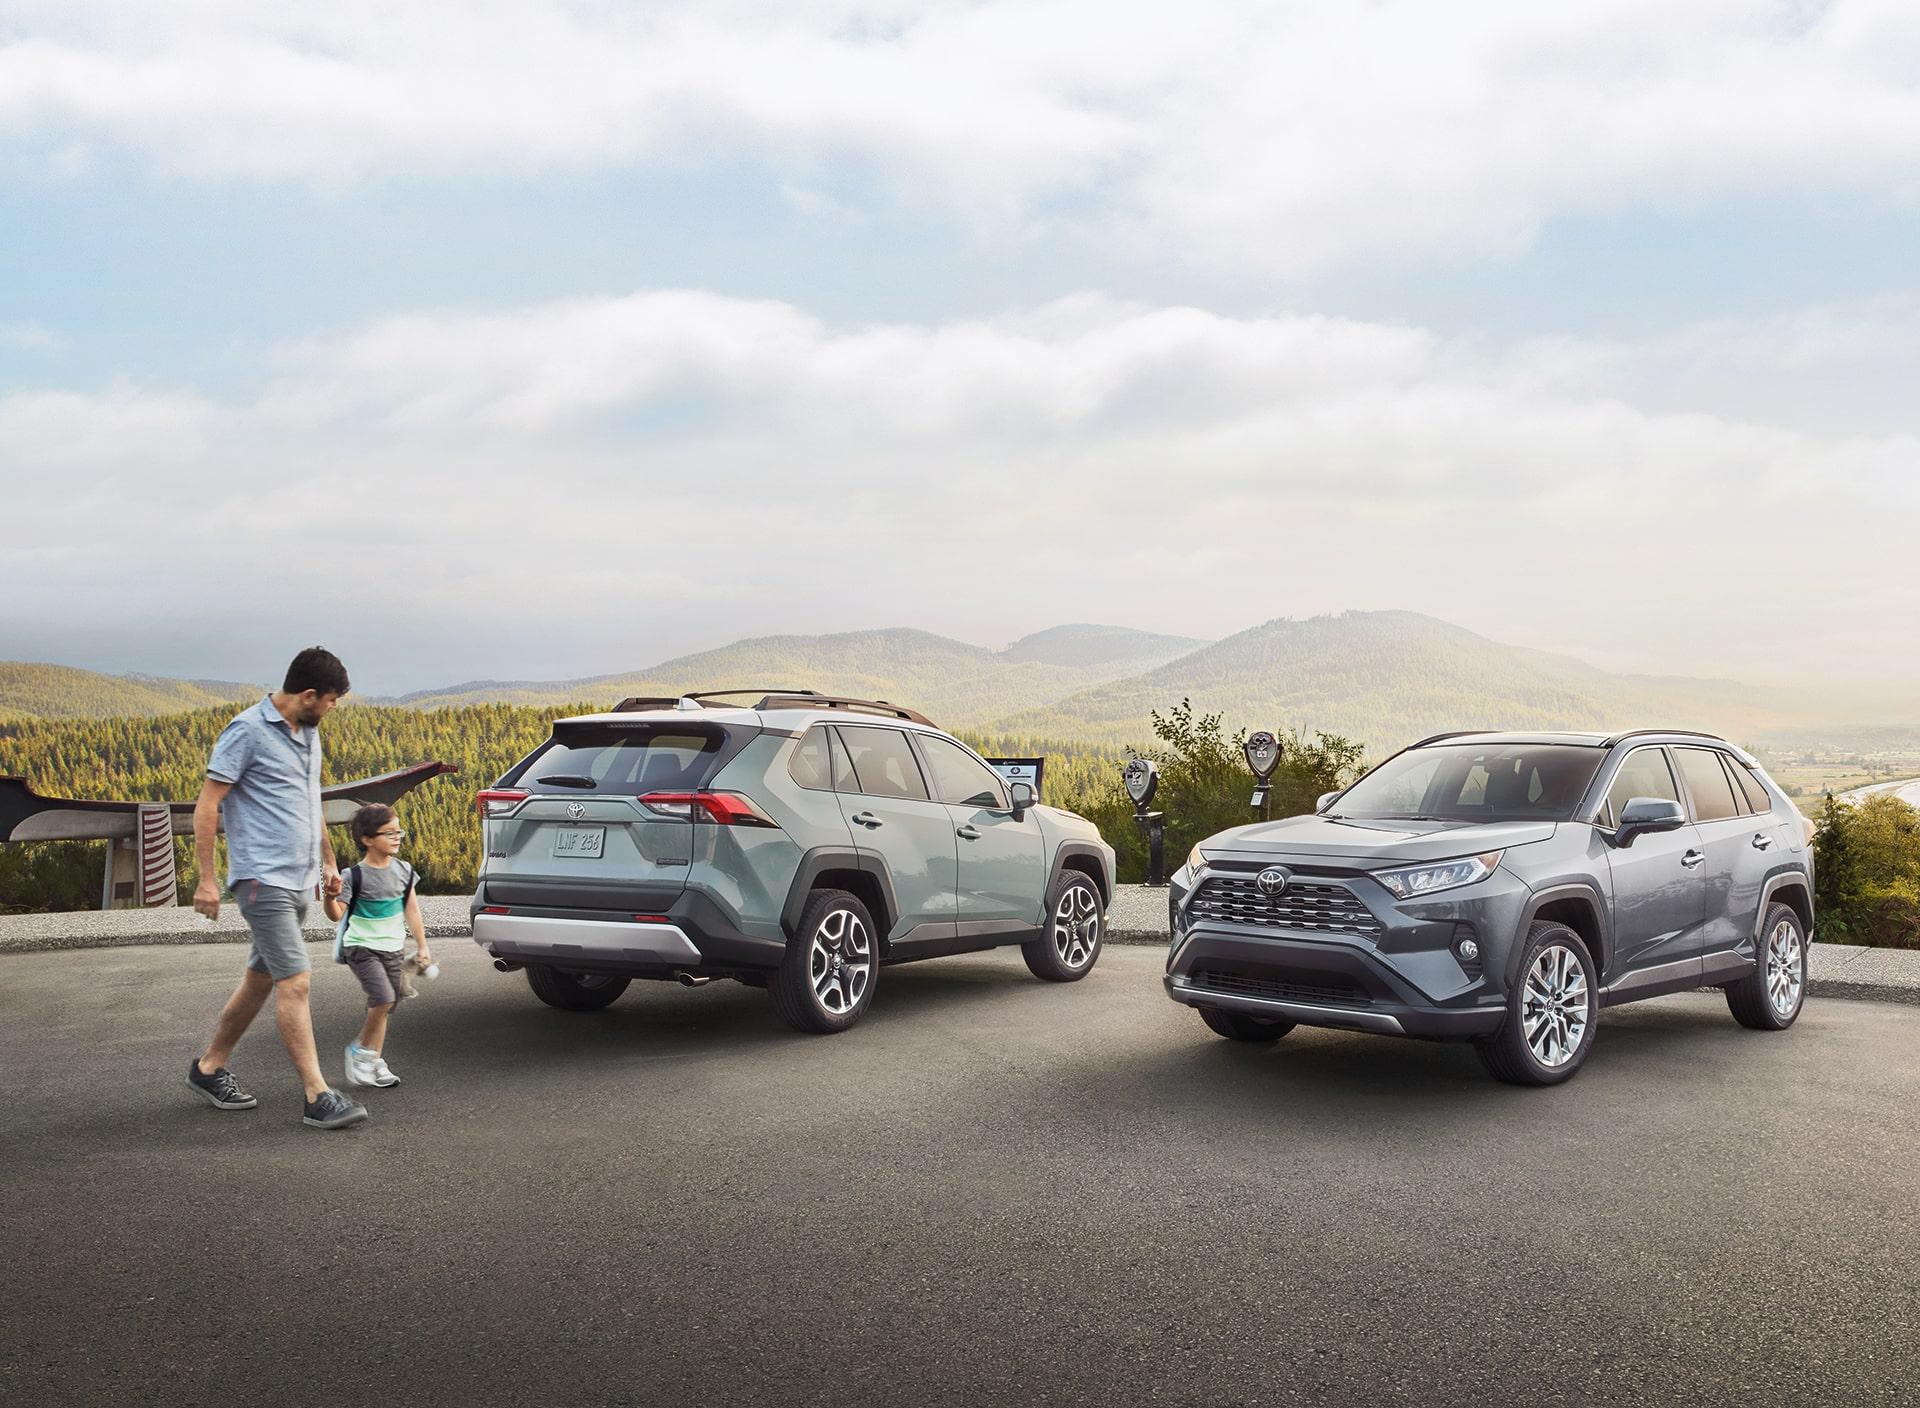 New Toyota SUVs